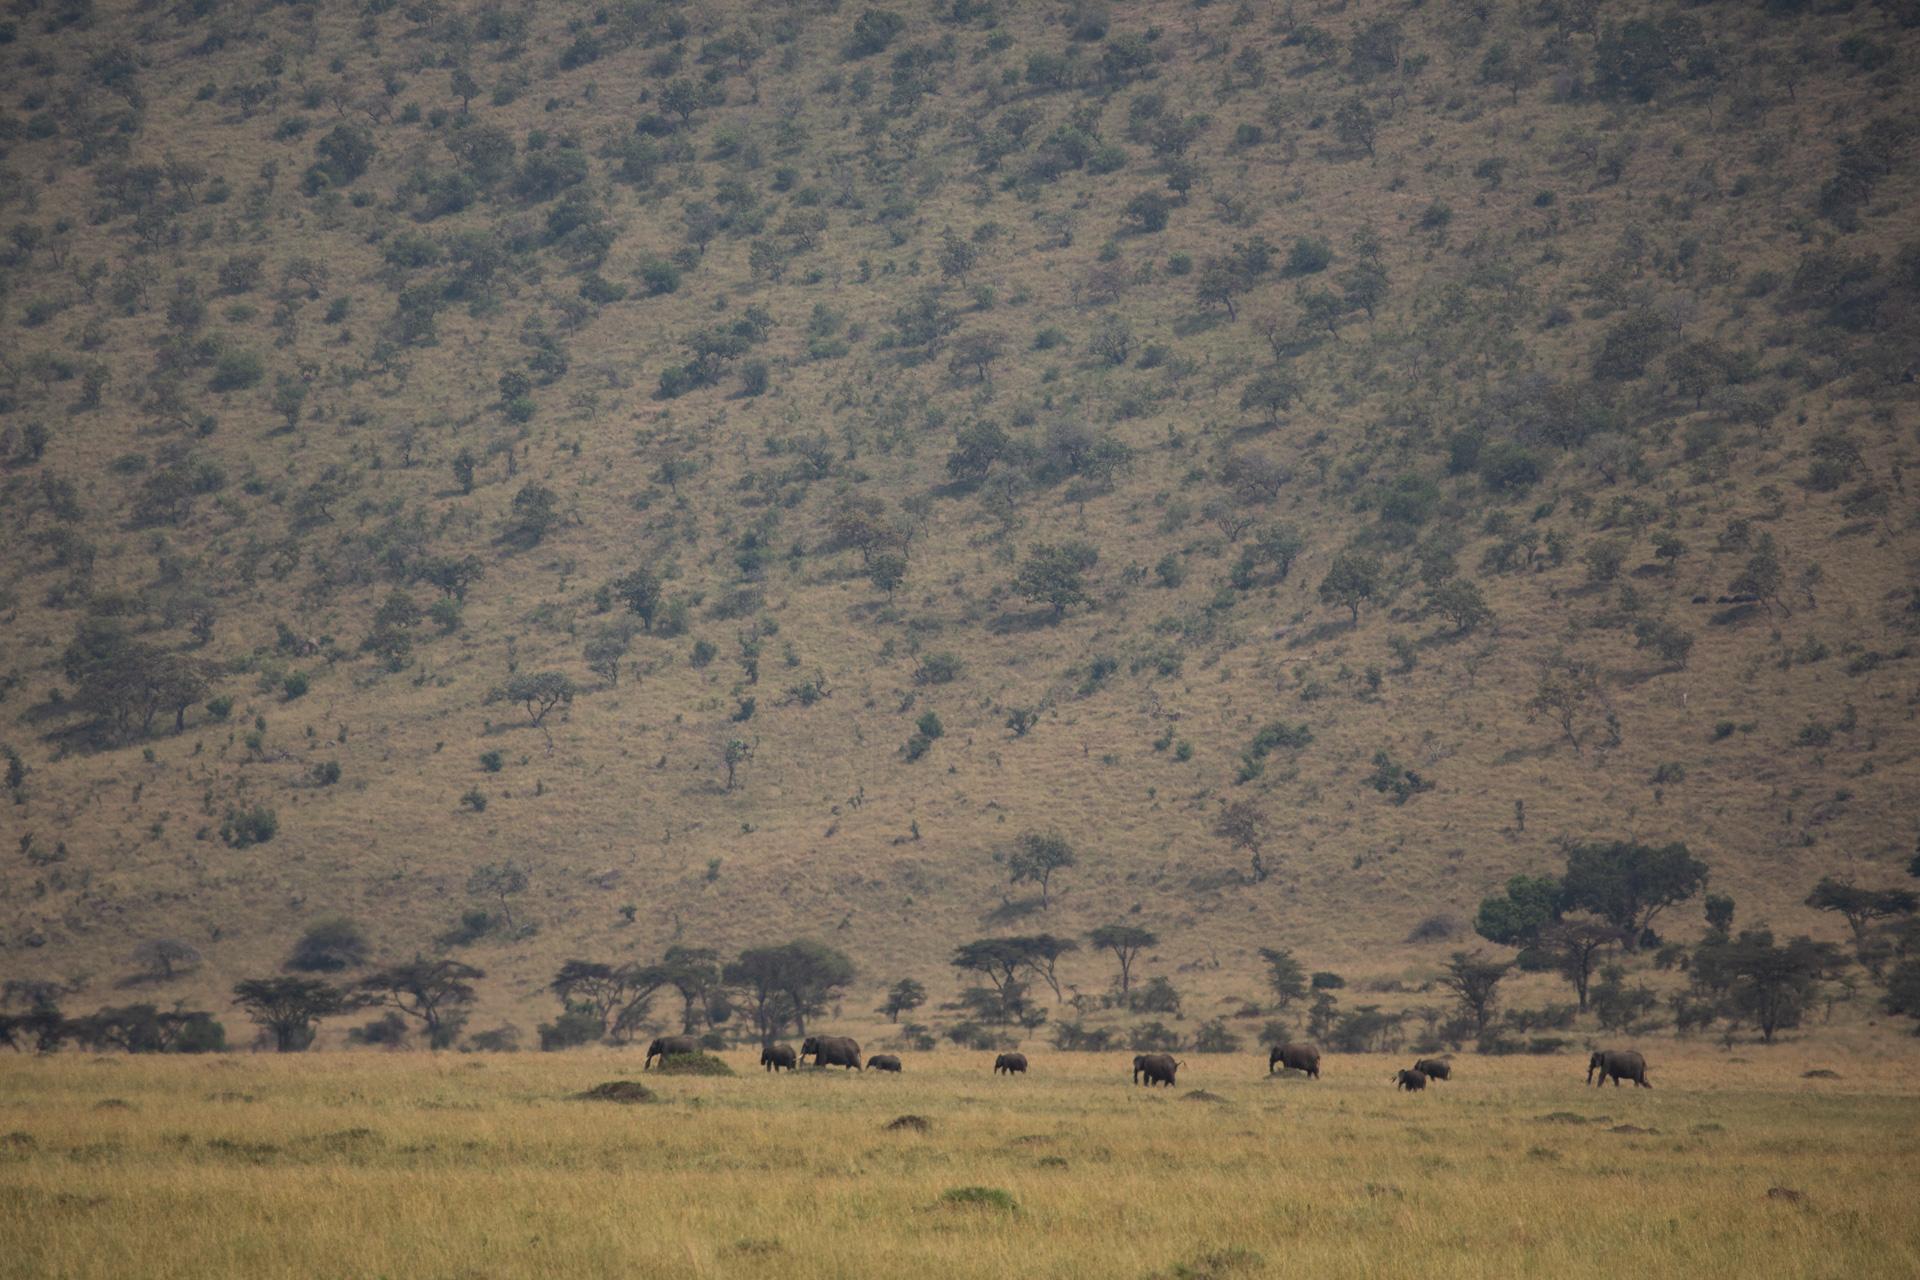 elephant on the escarpment